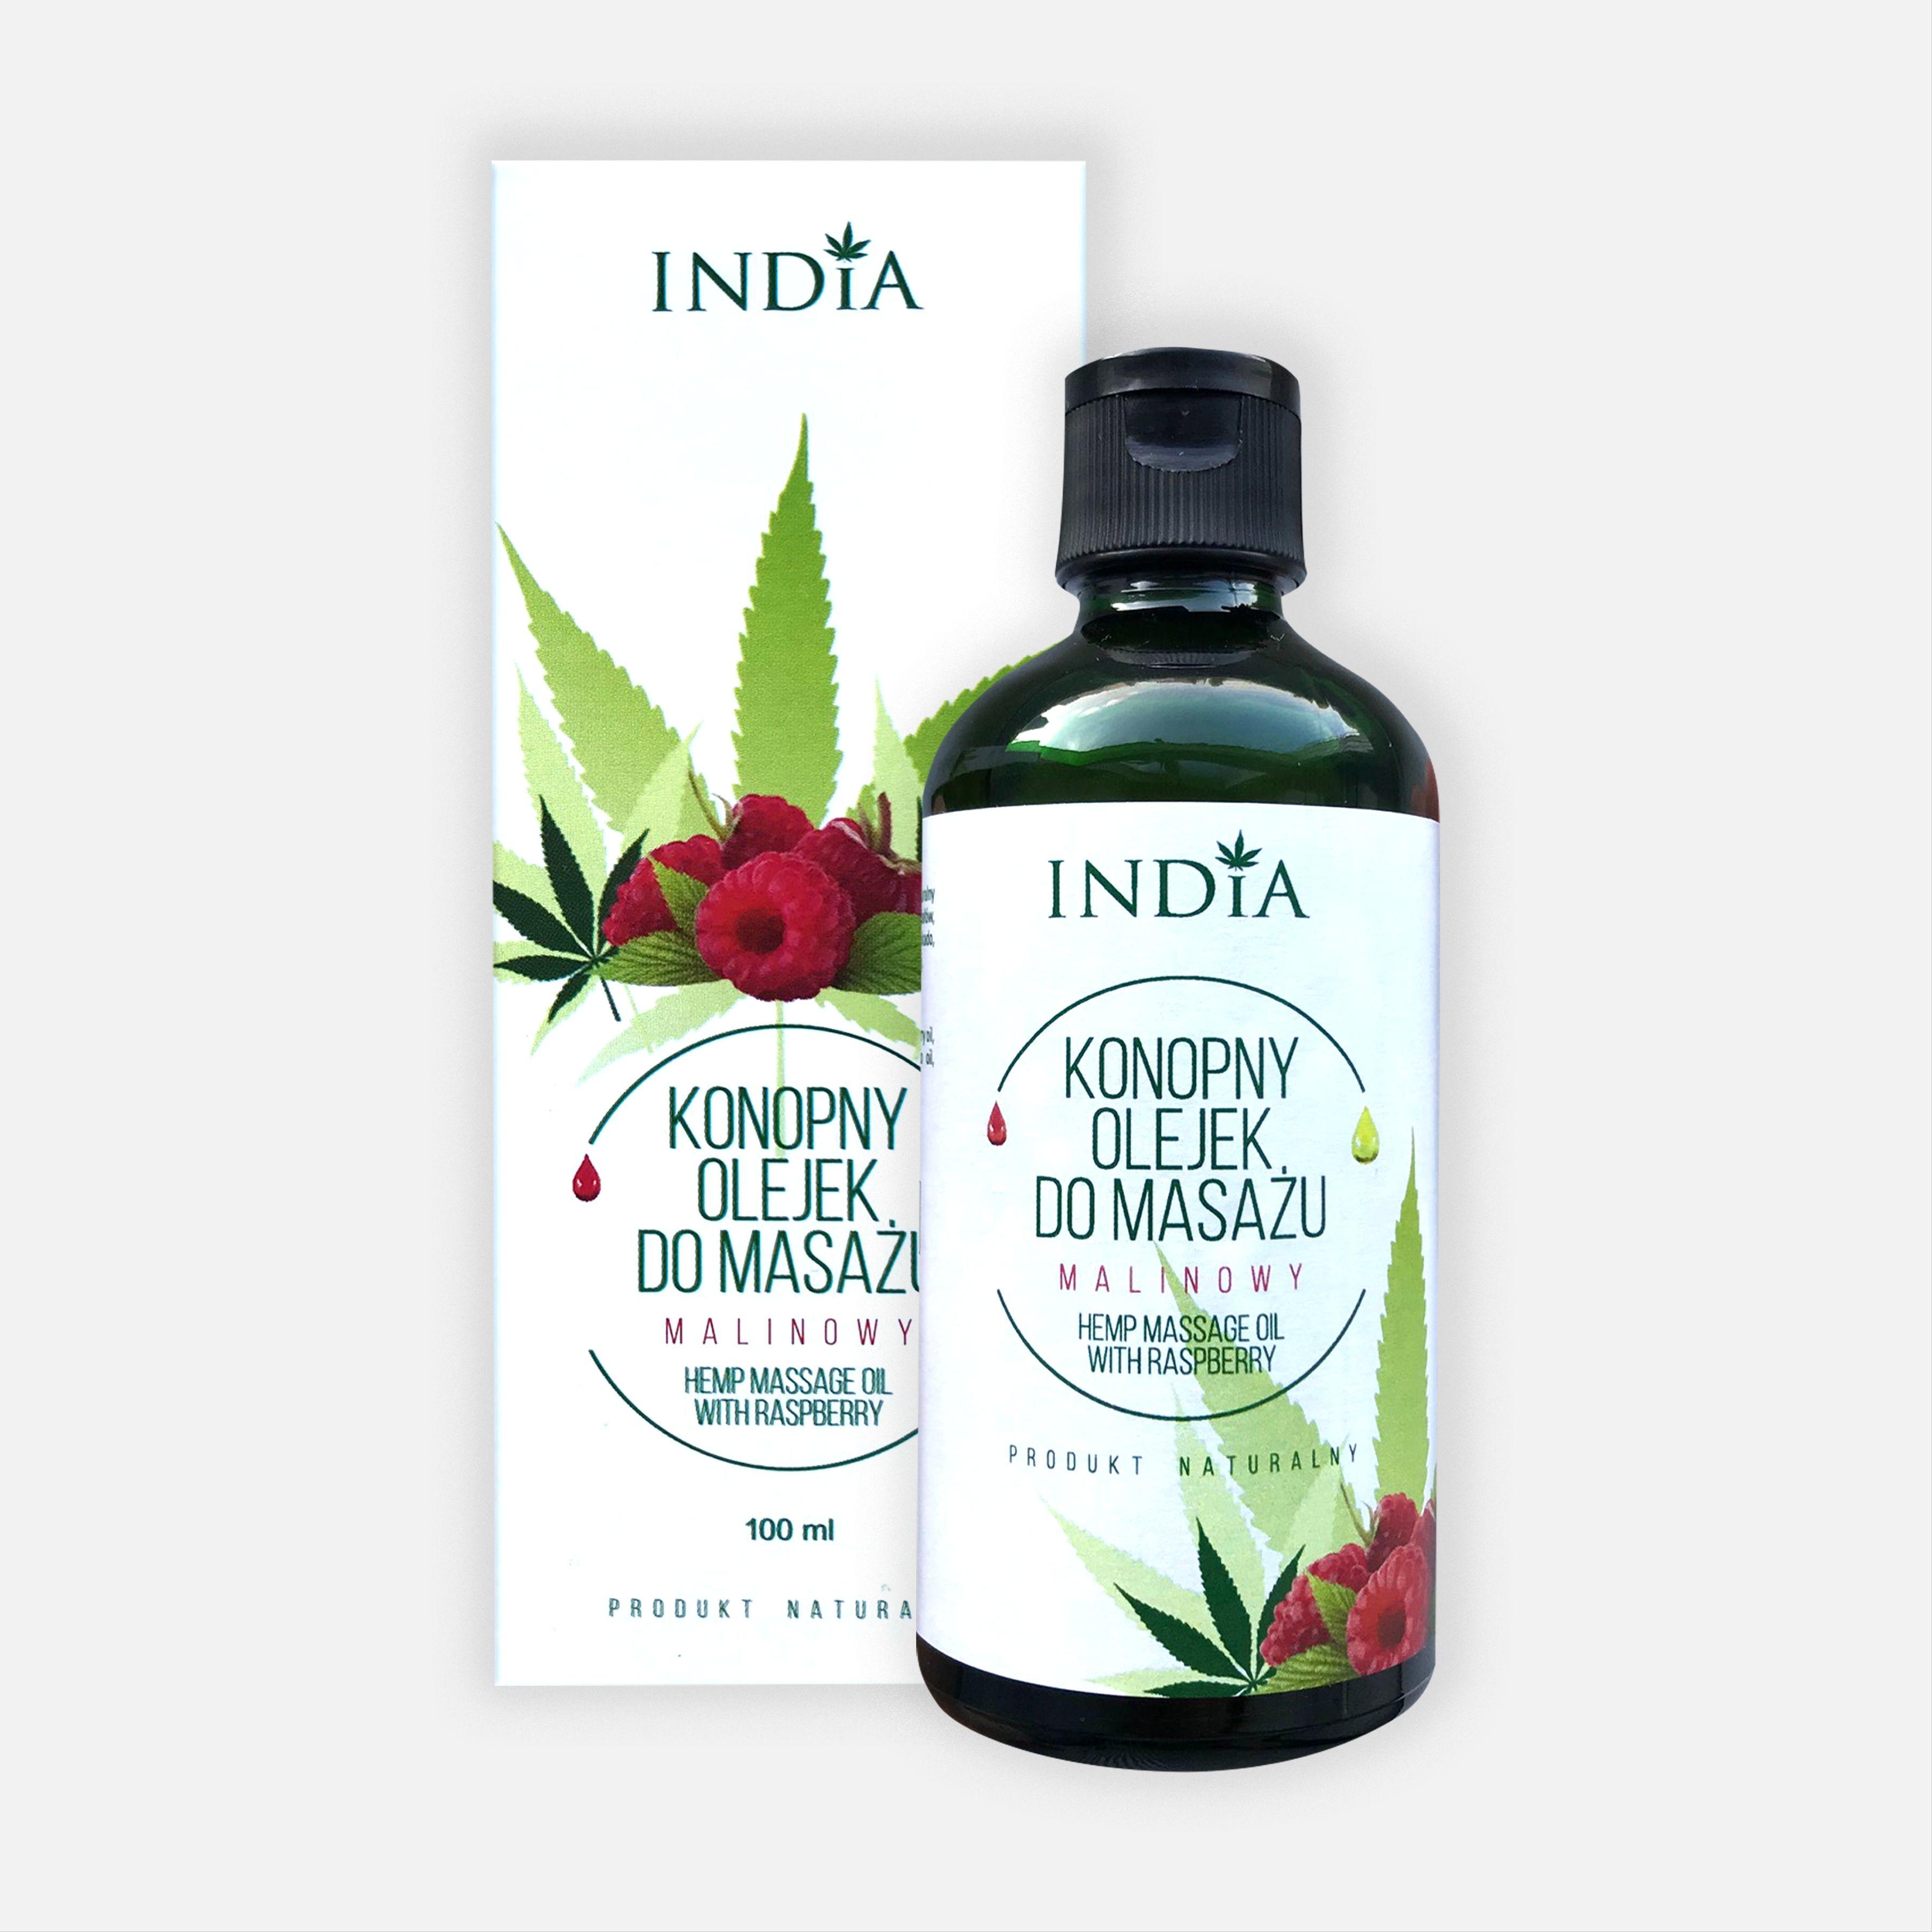 India cosmetics India konopny olejek do masażu malinowy 8FE7-299AE